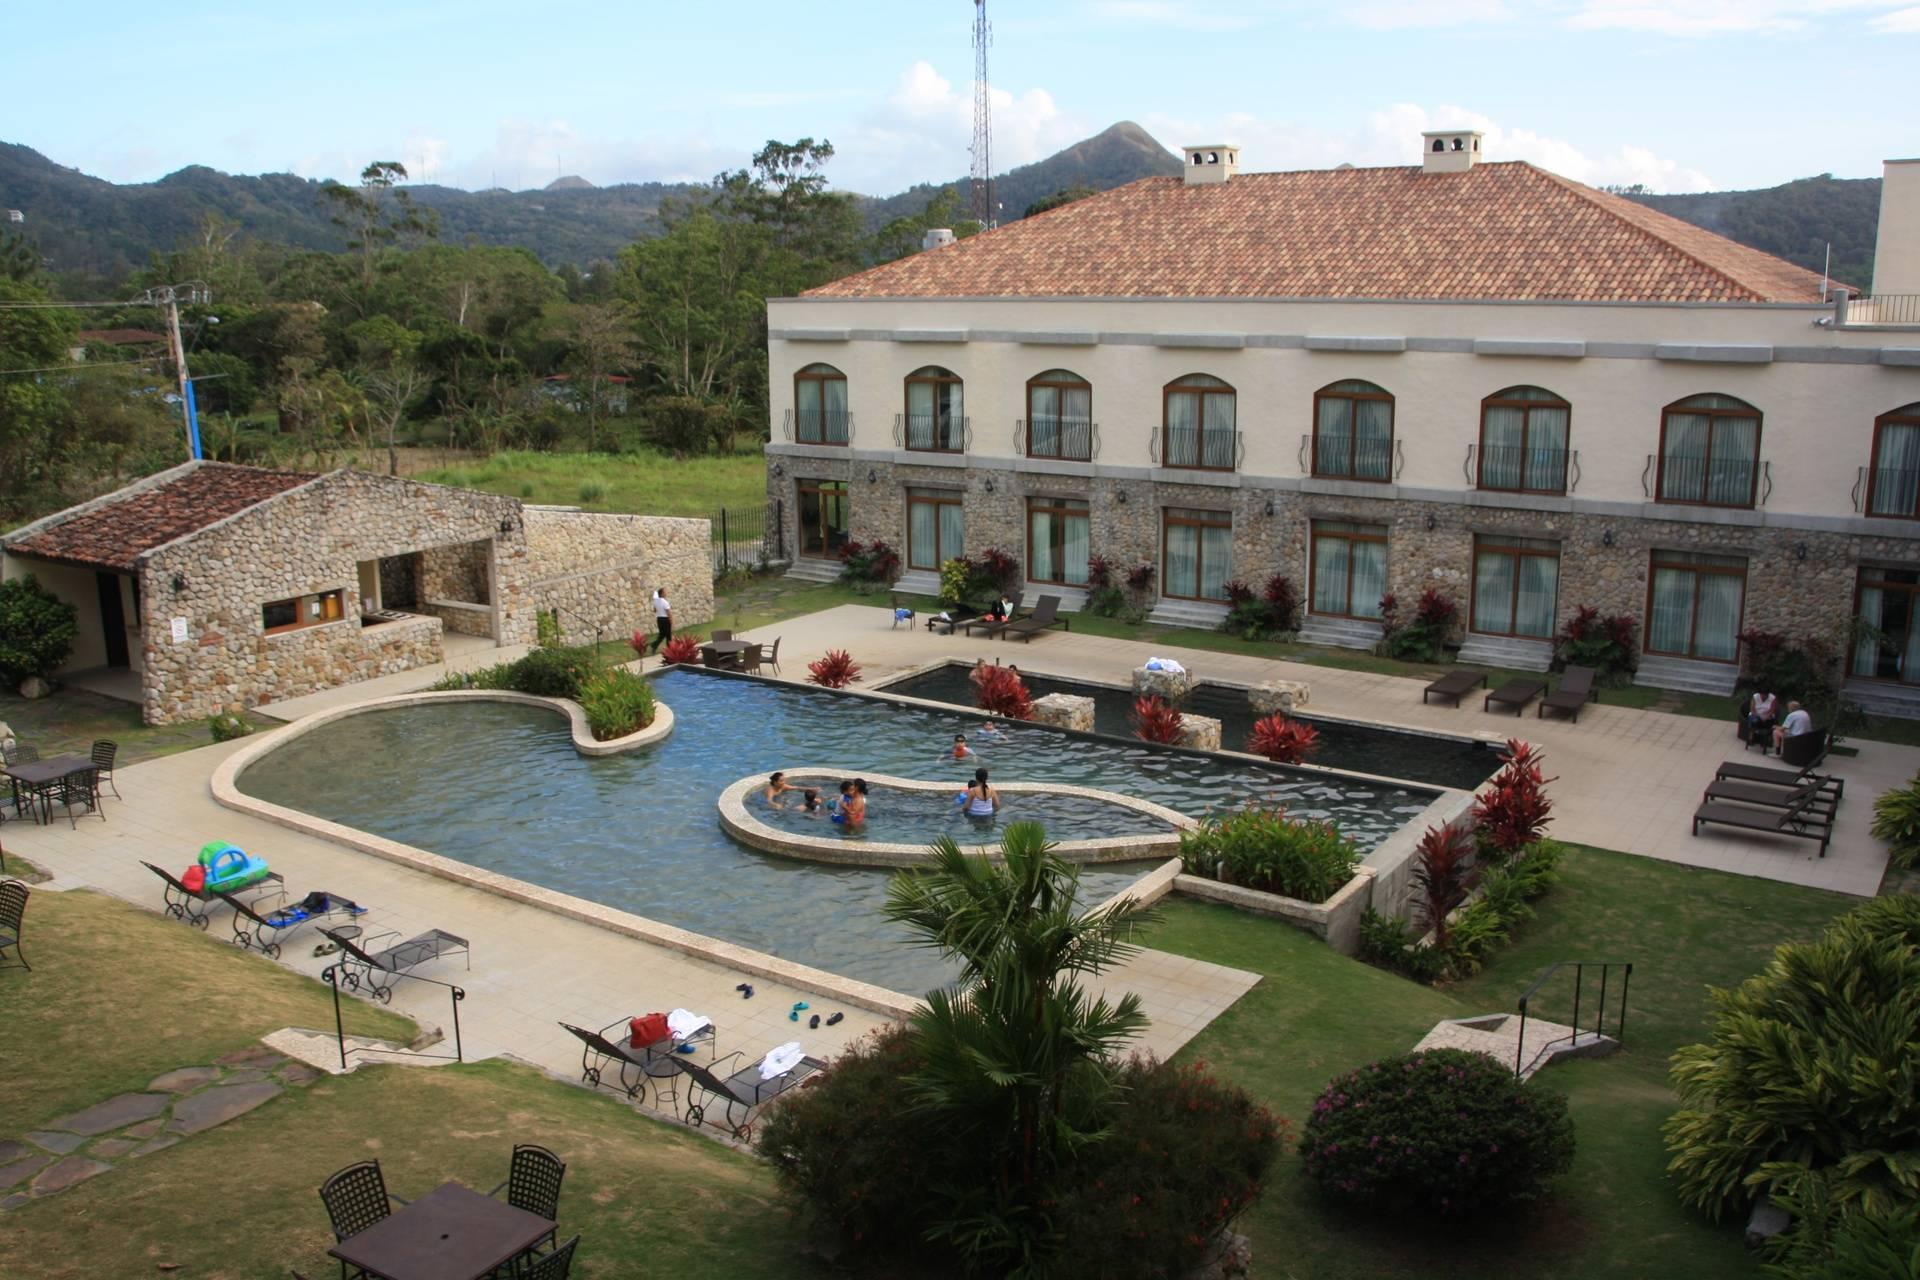 Los Mandarinos Hotel in Anton Valley